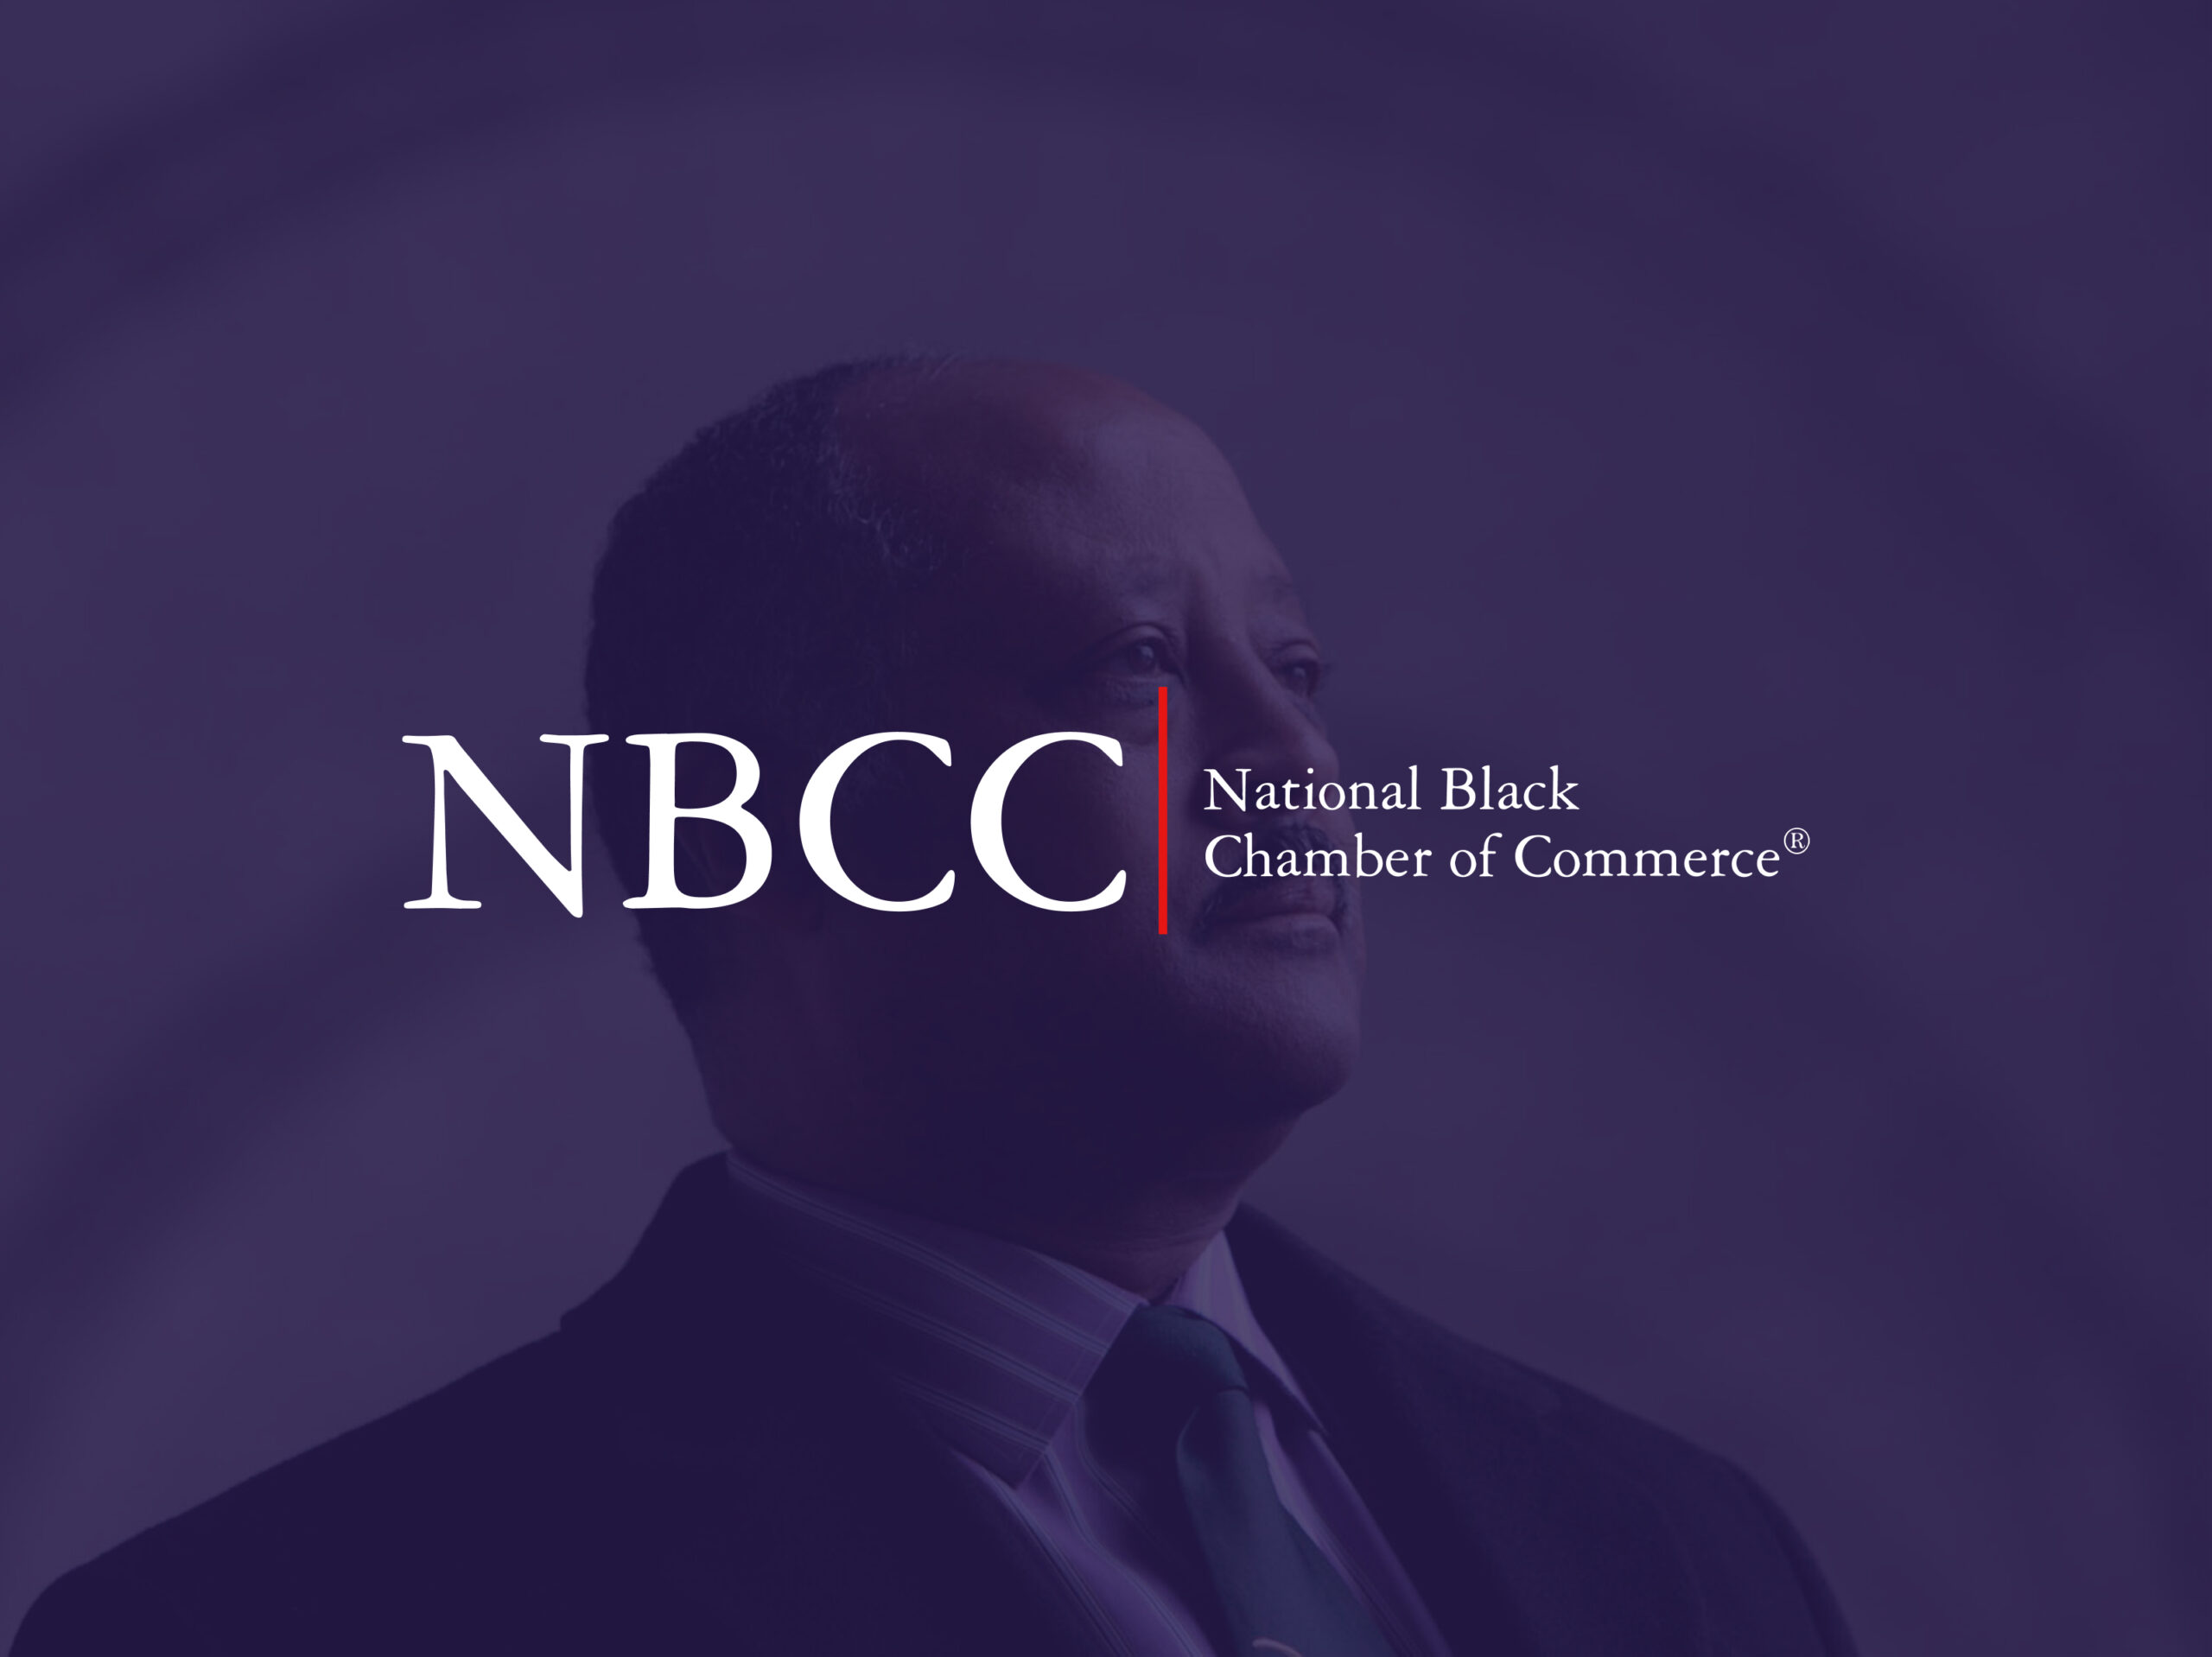 National Black Chamber of Commerce@2x